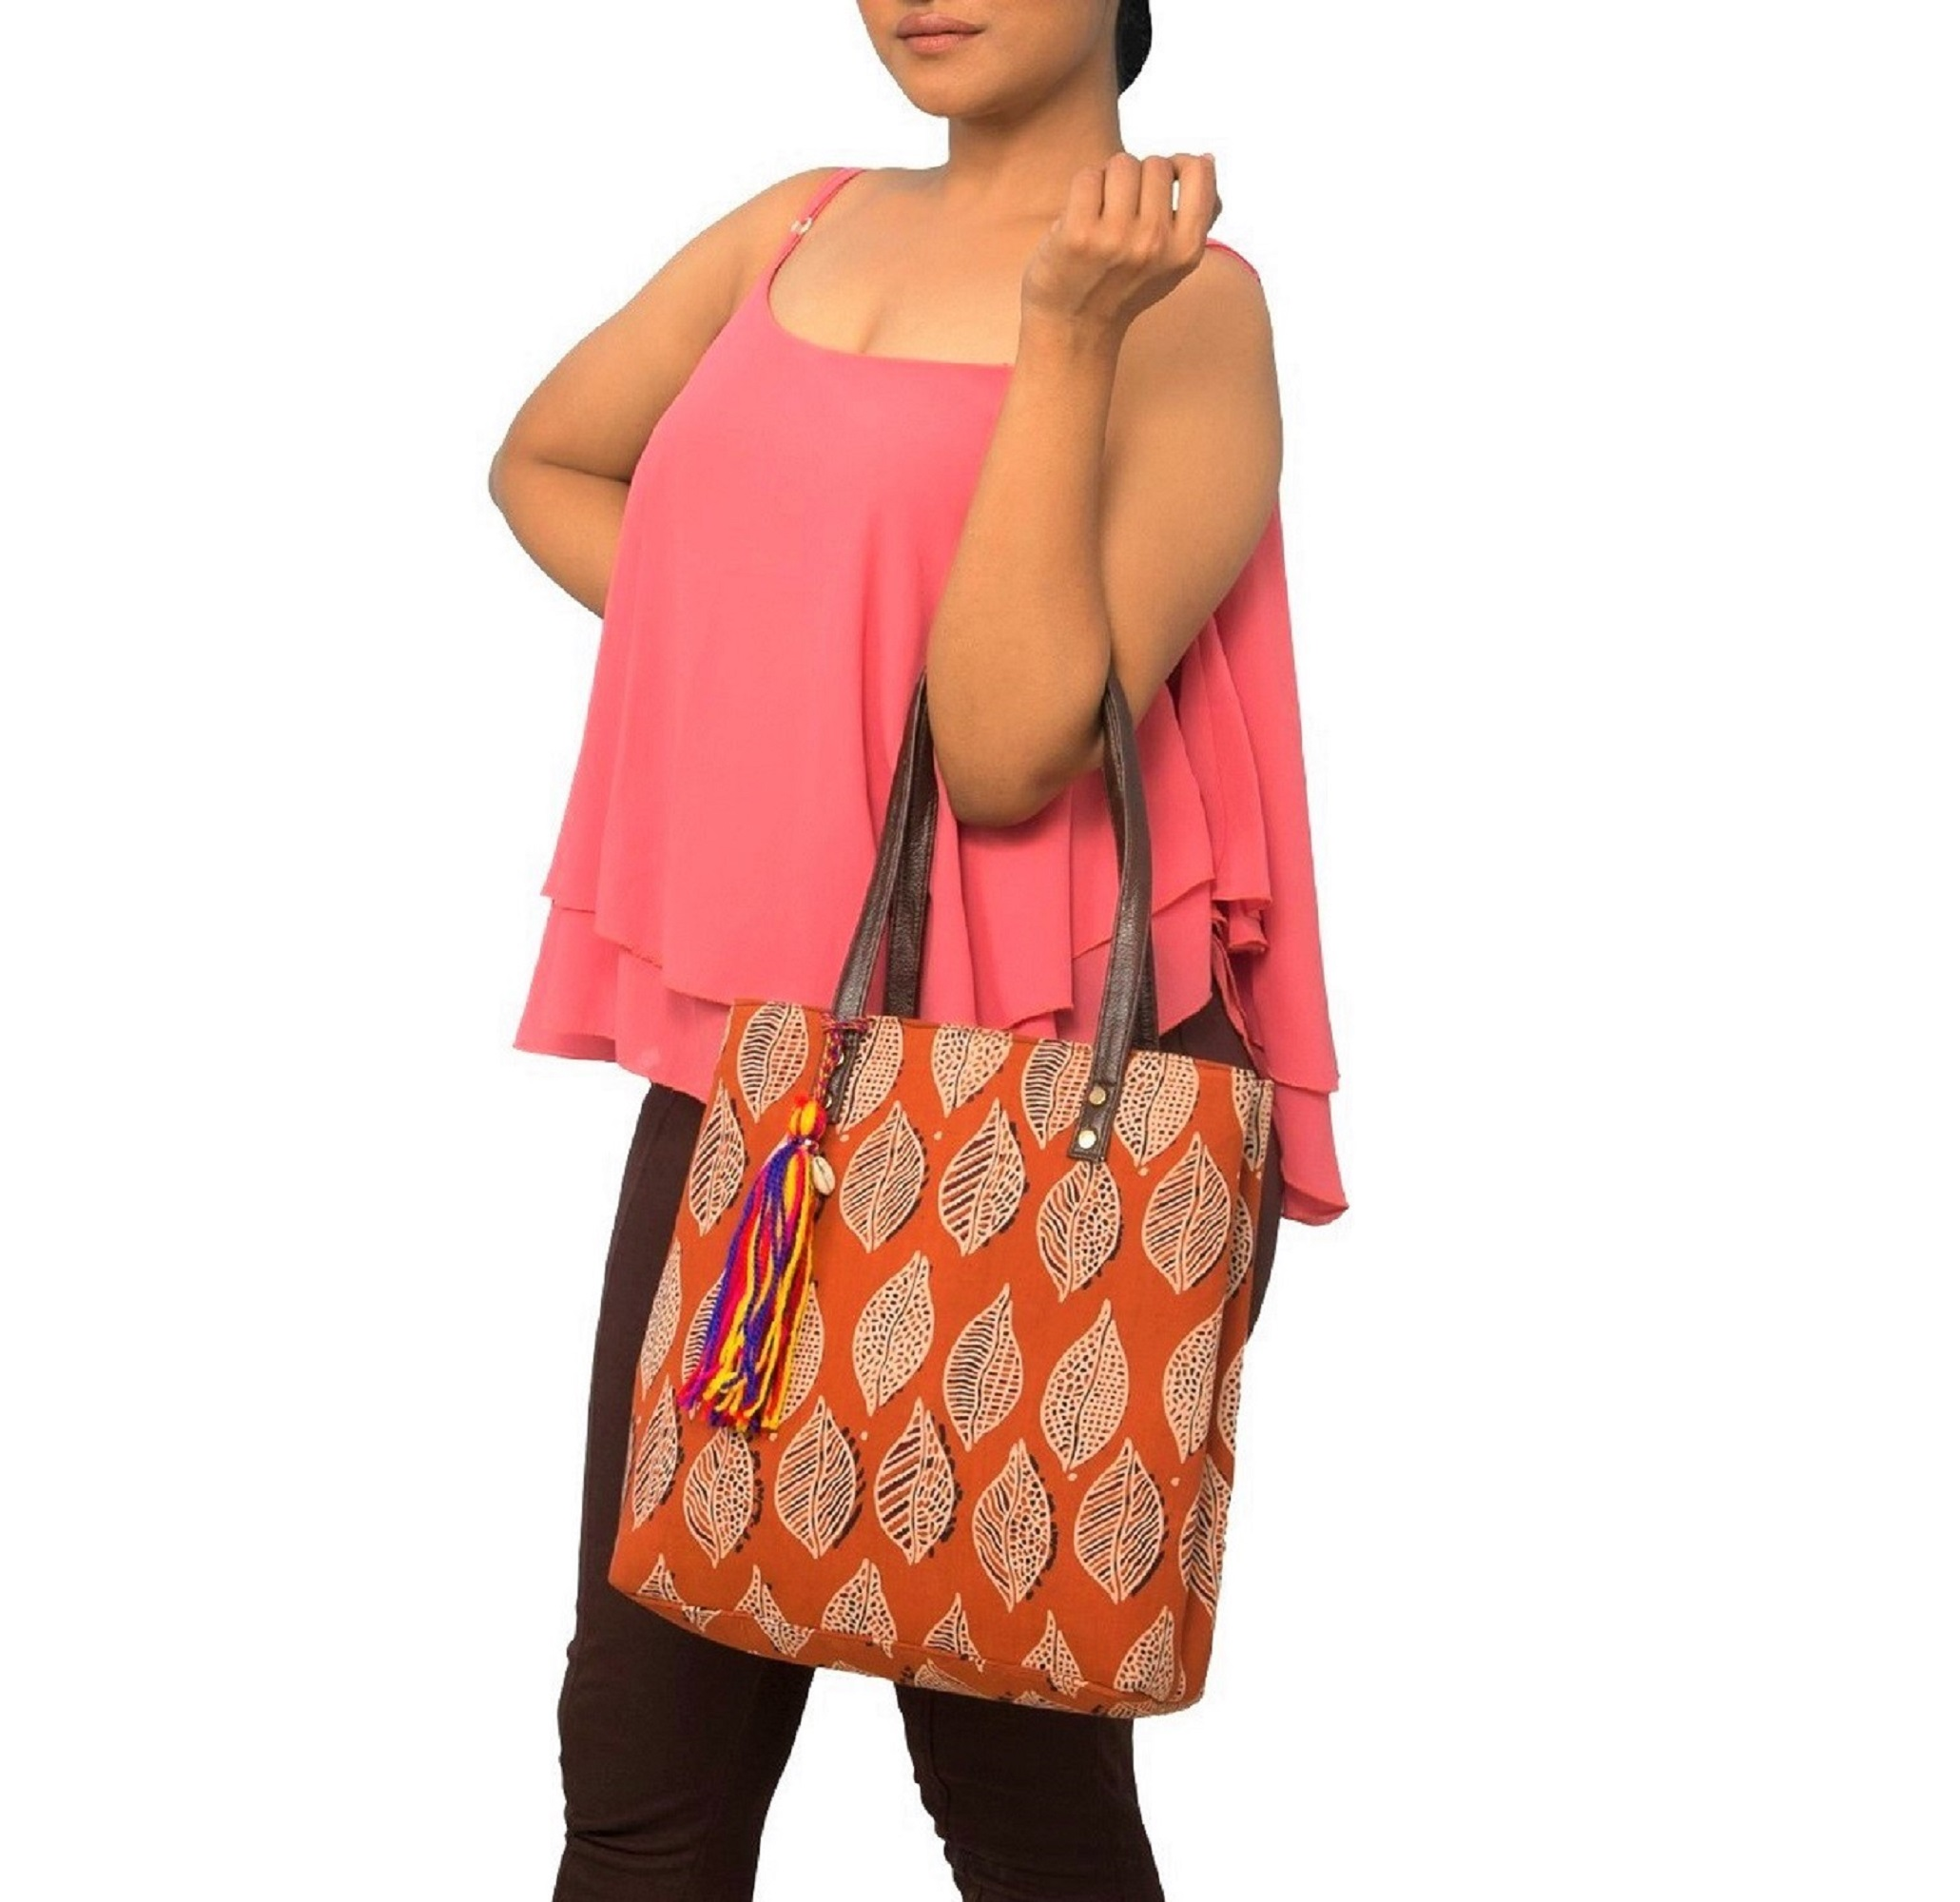 Vivinkaa | Vivinkaa ethnic faux leather cotton mini orange leaf tote bag